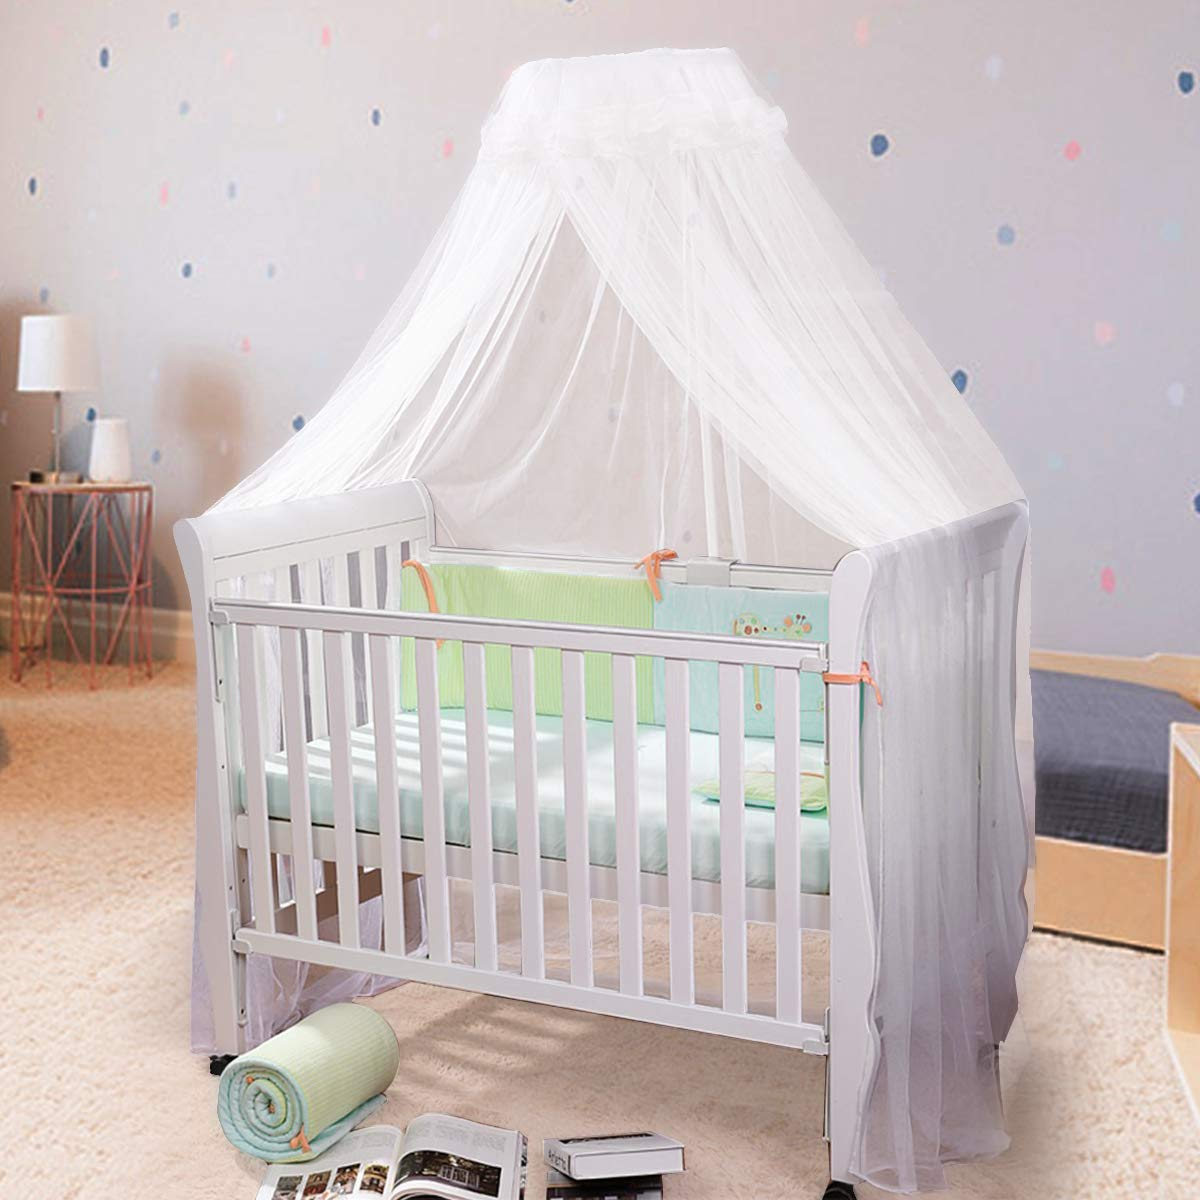 JOYLIFE Baby Net Baby Toddler Bed Crib Dome Canopy Netting (White)